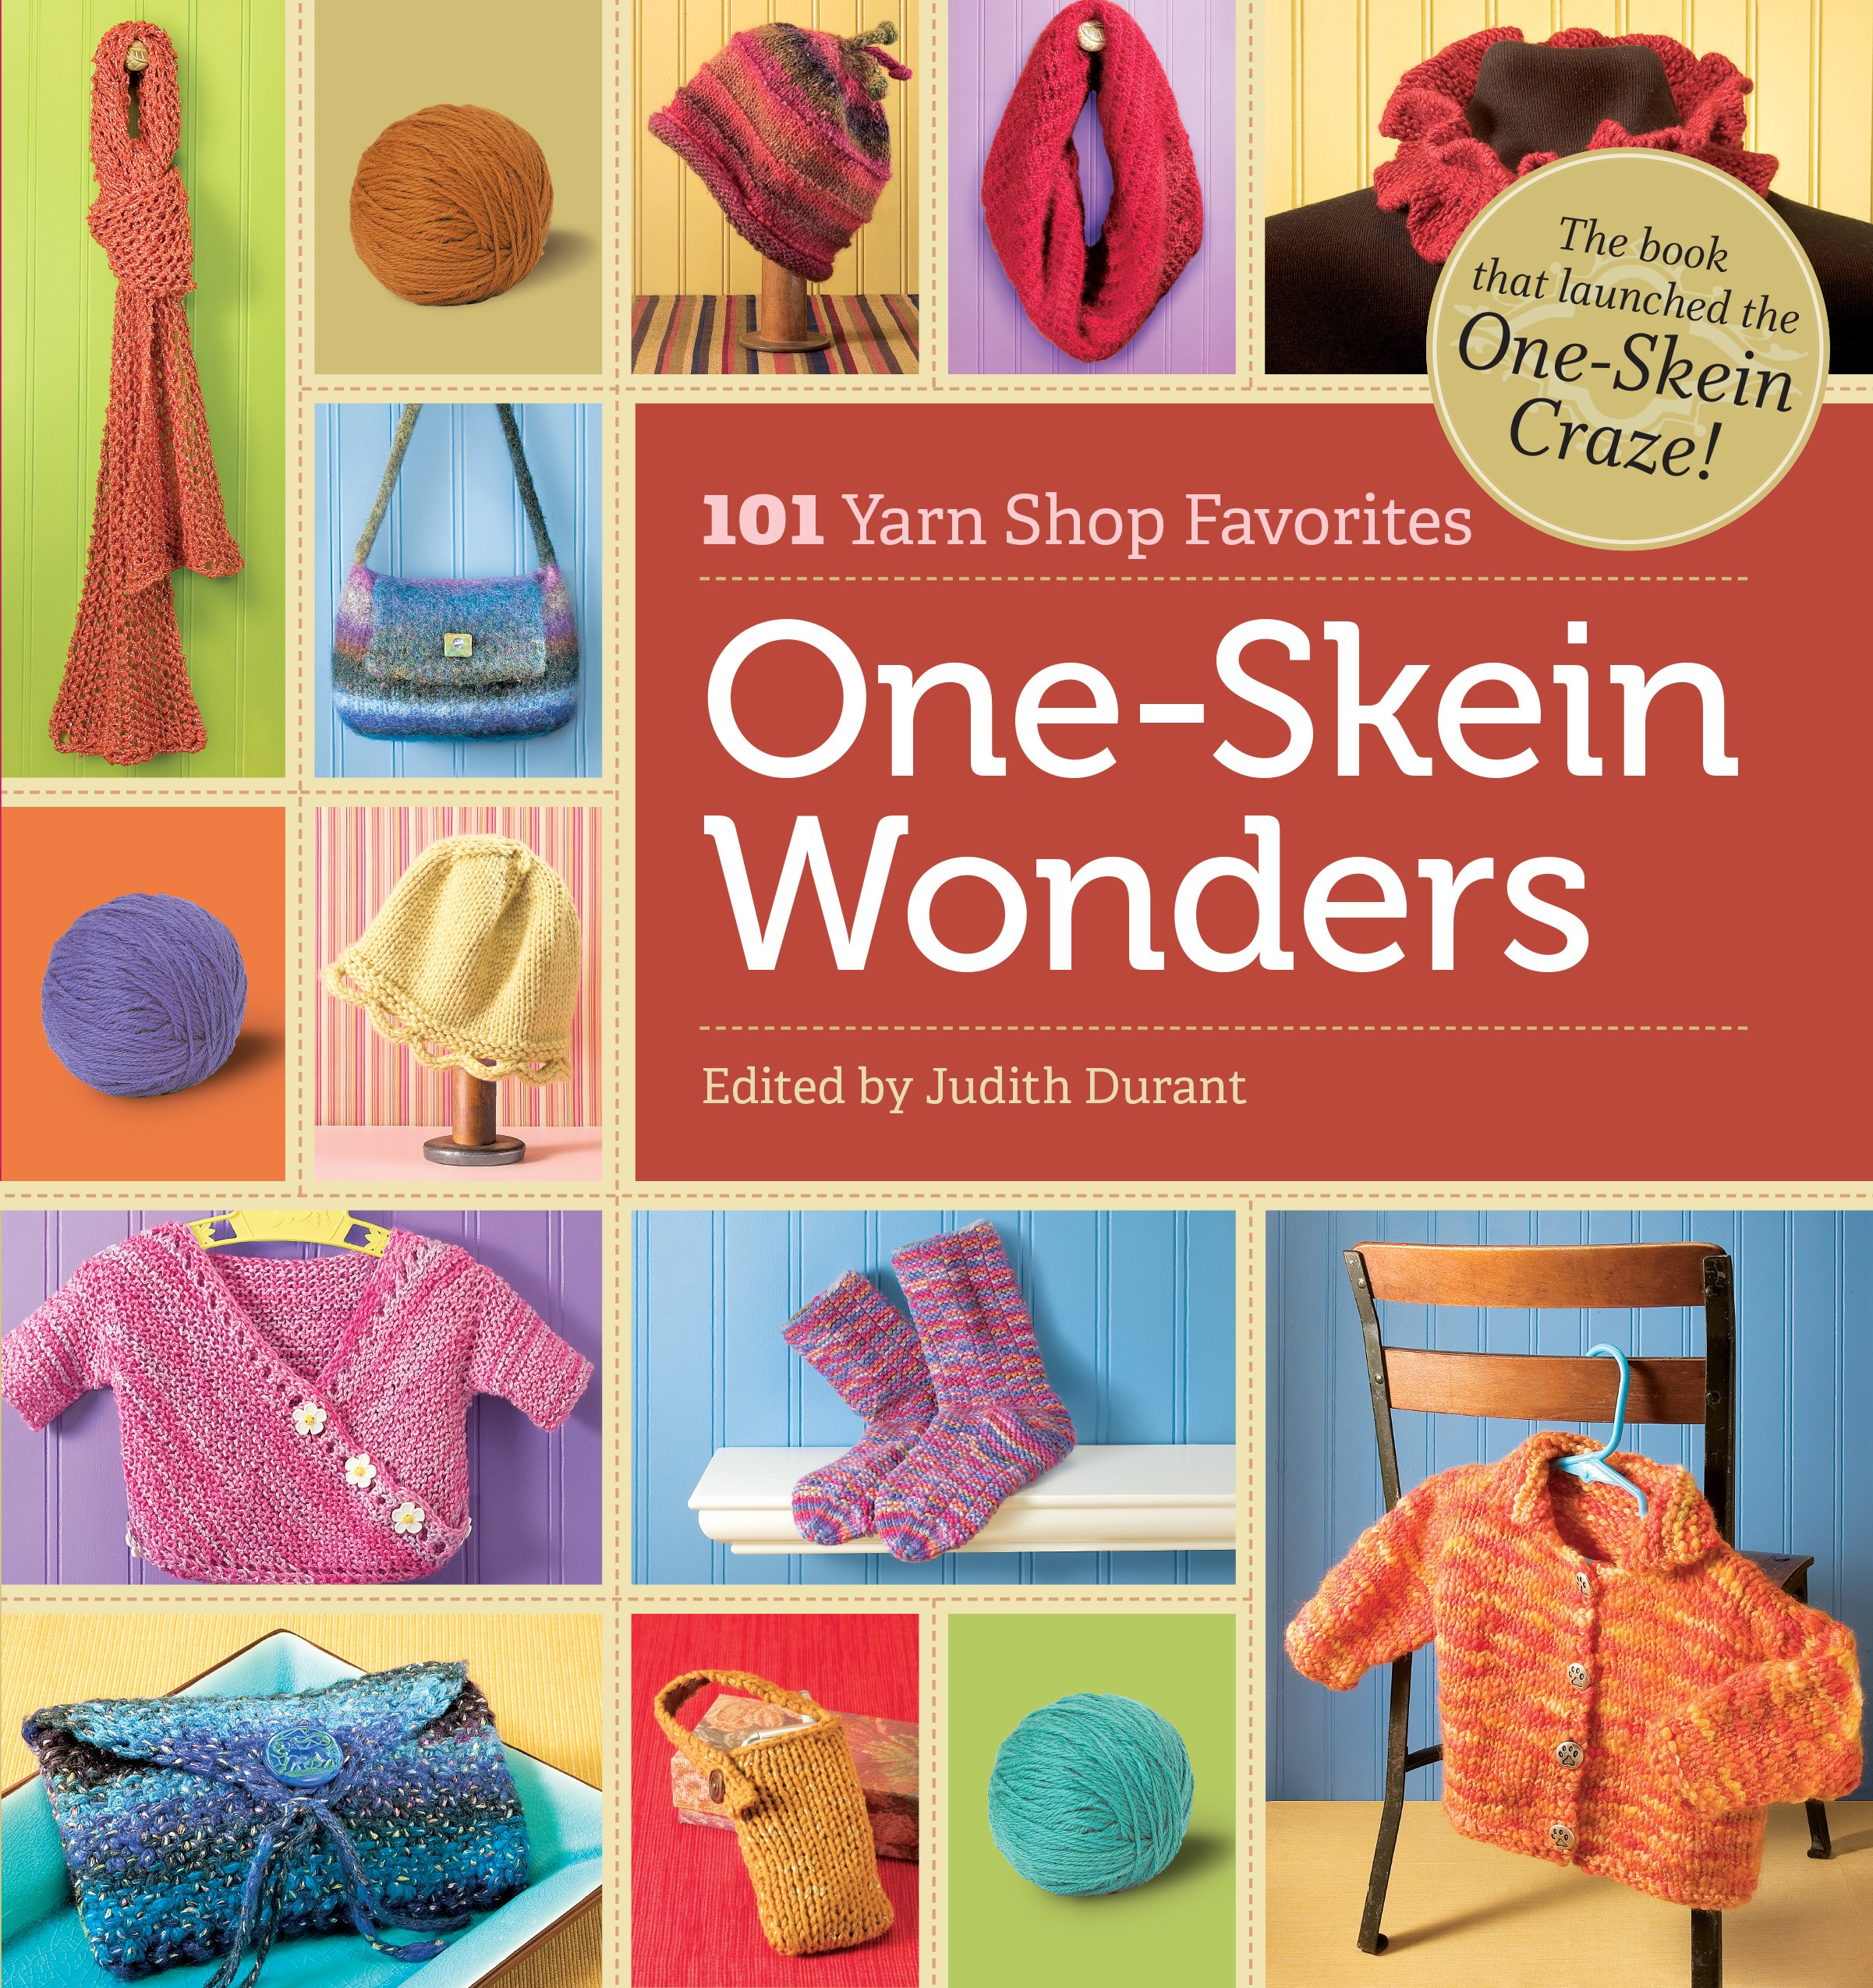 One Skein Wonders%C2%AE Judith Durant product image